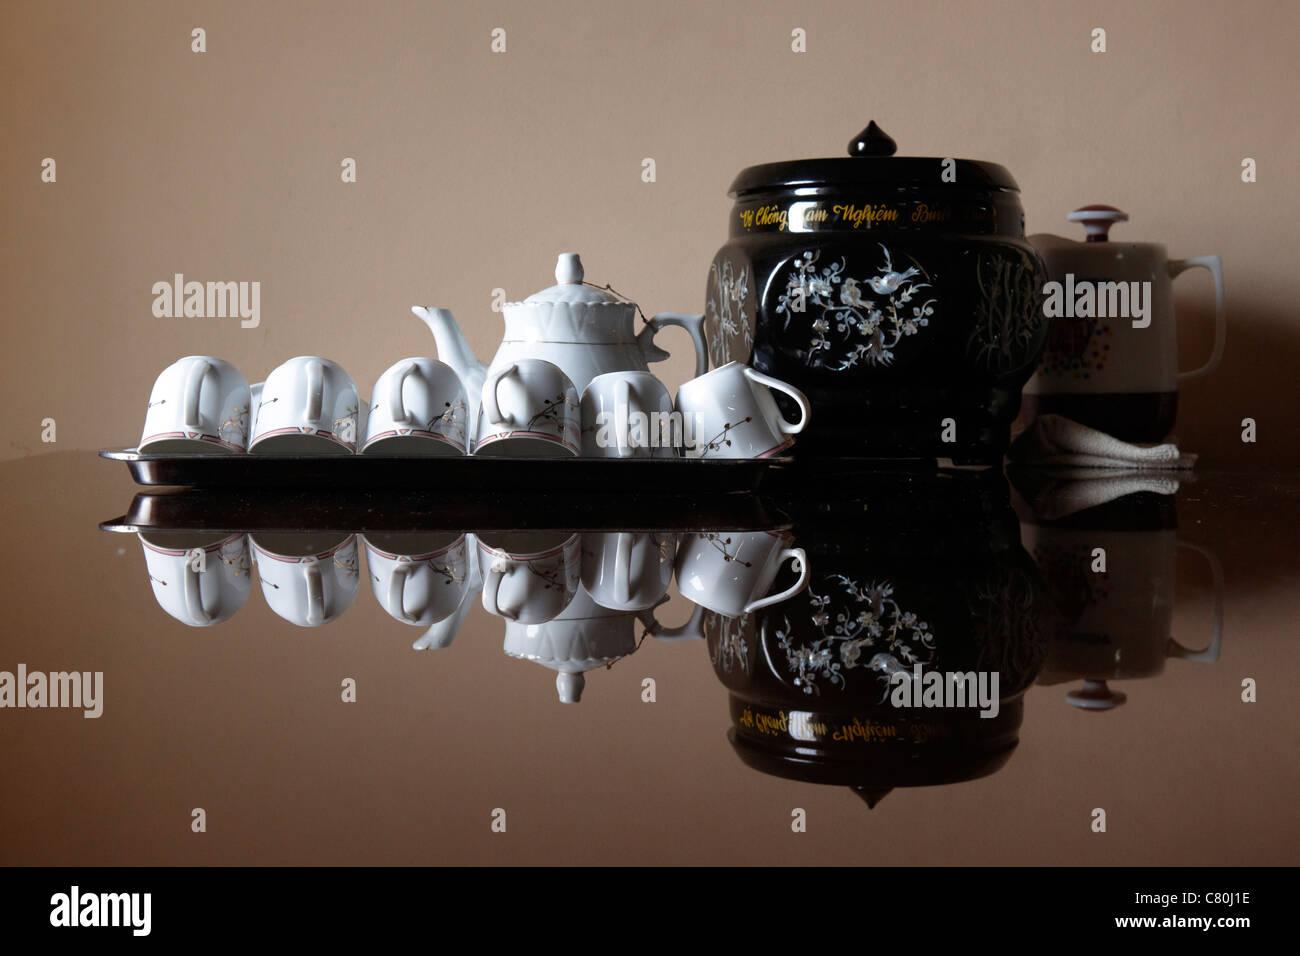 Vietnam, ceramic tea pot and cups - Stock Image